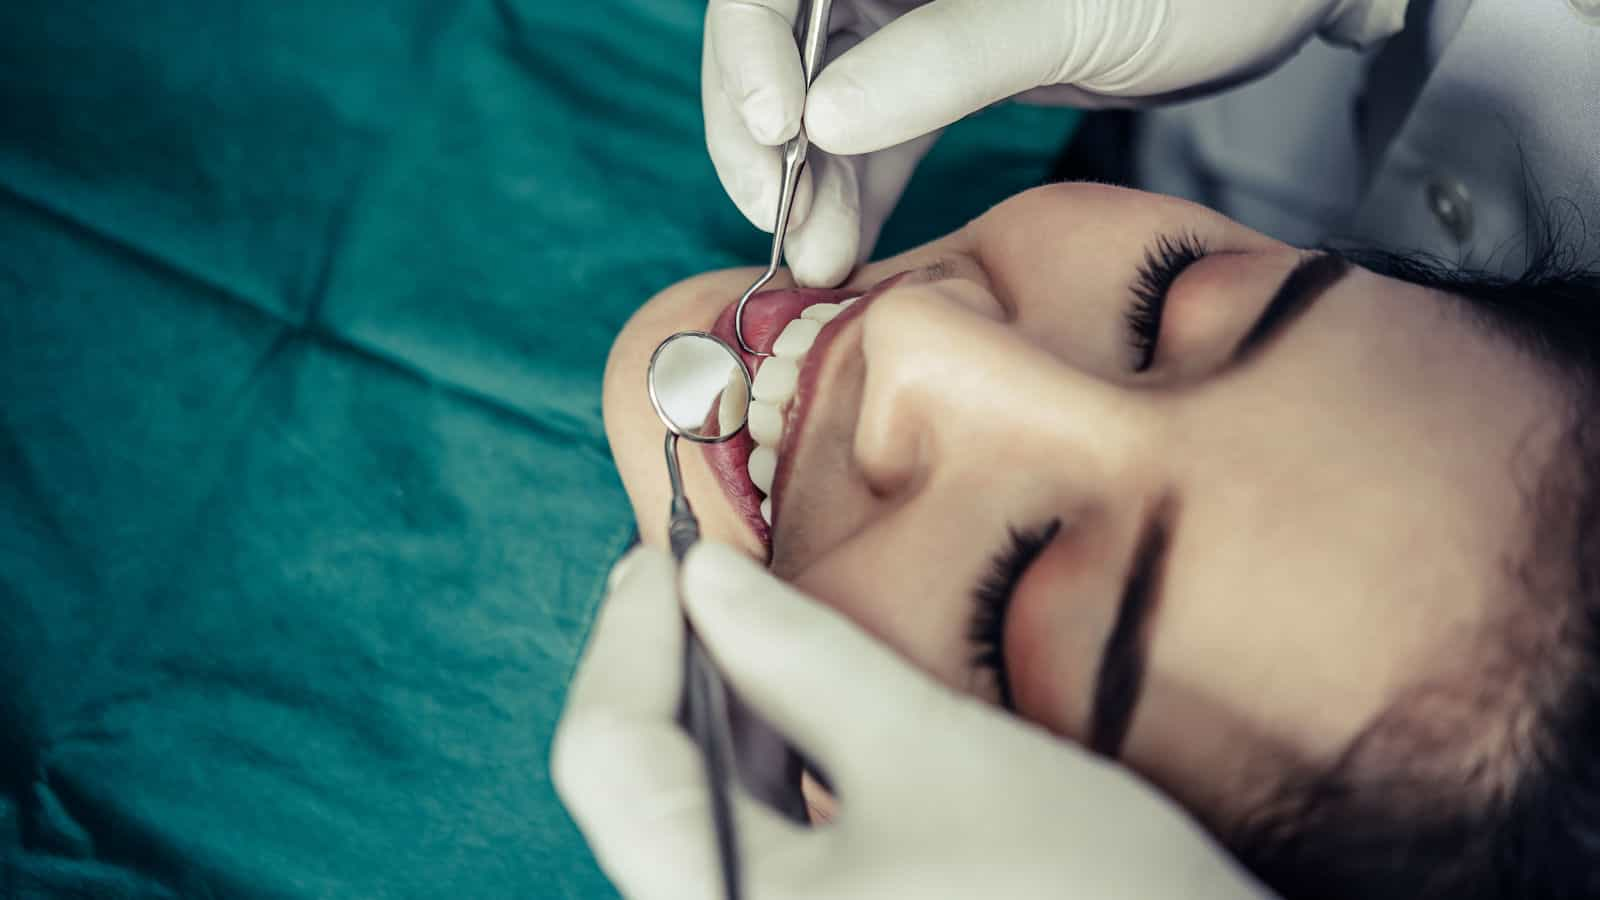 Dental Care Associates of Tucson